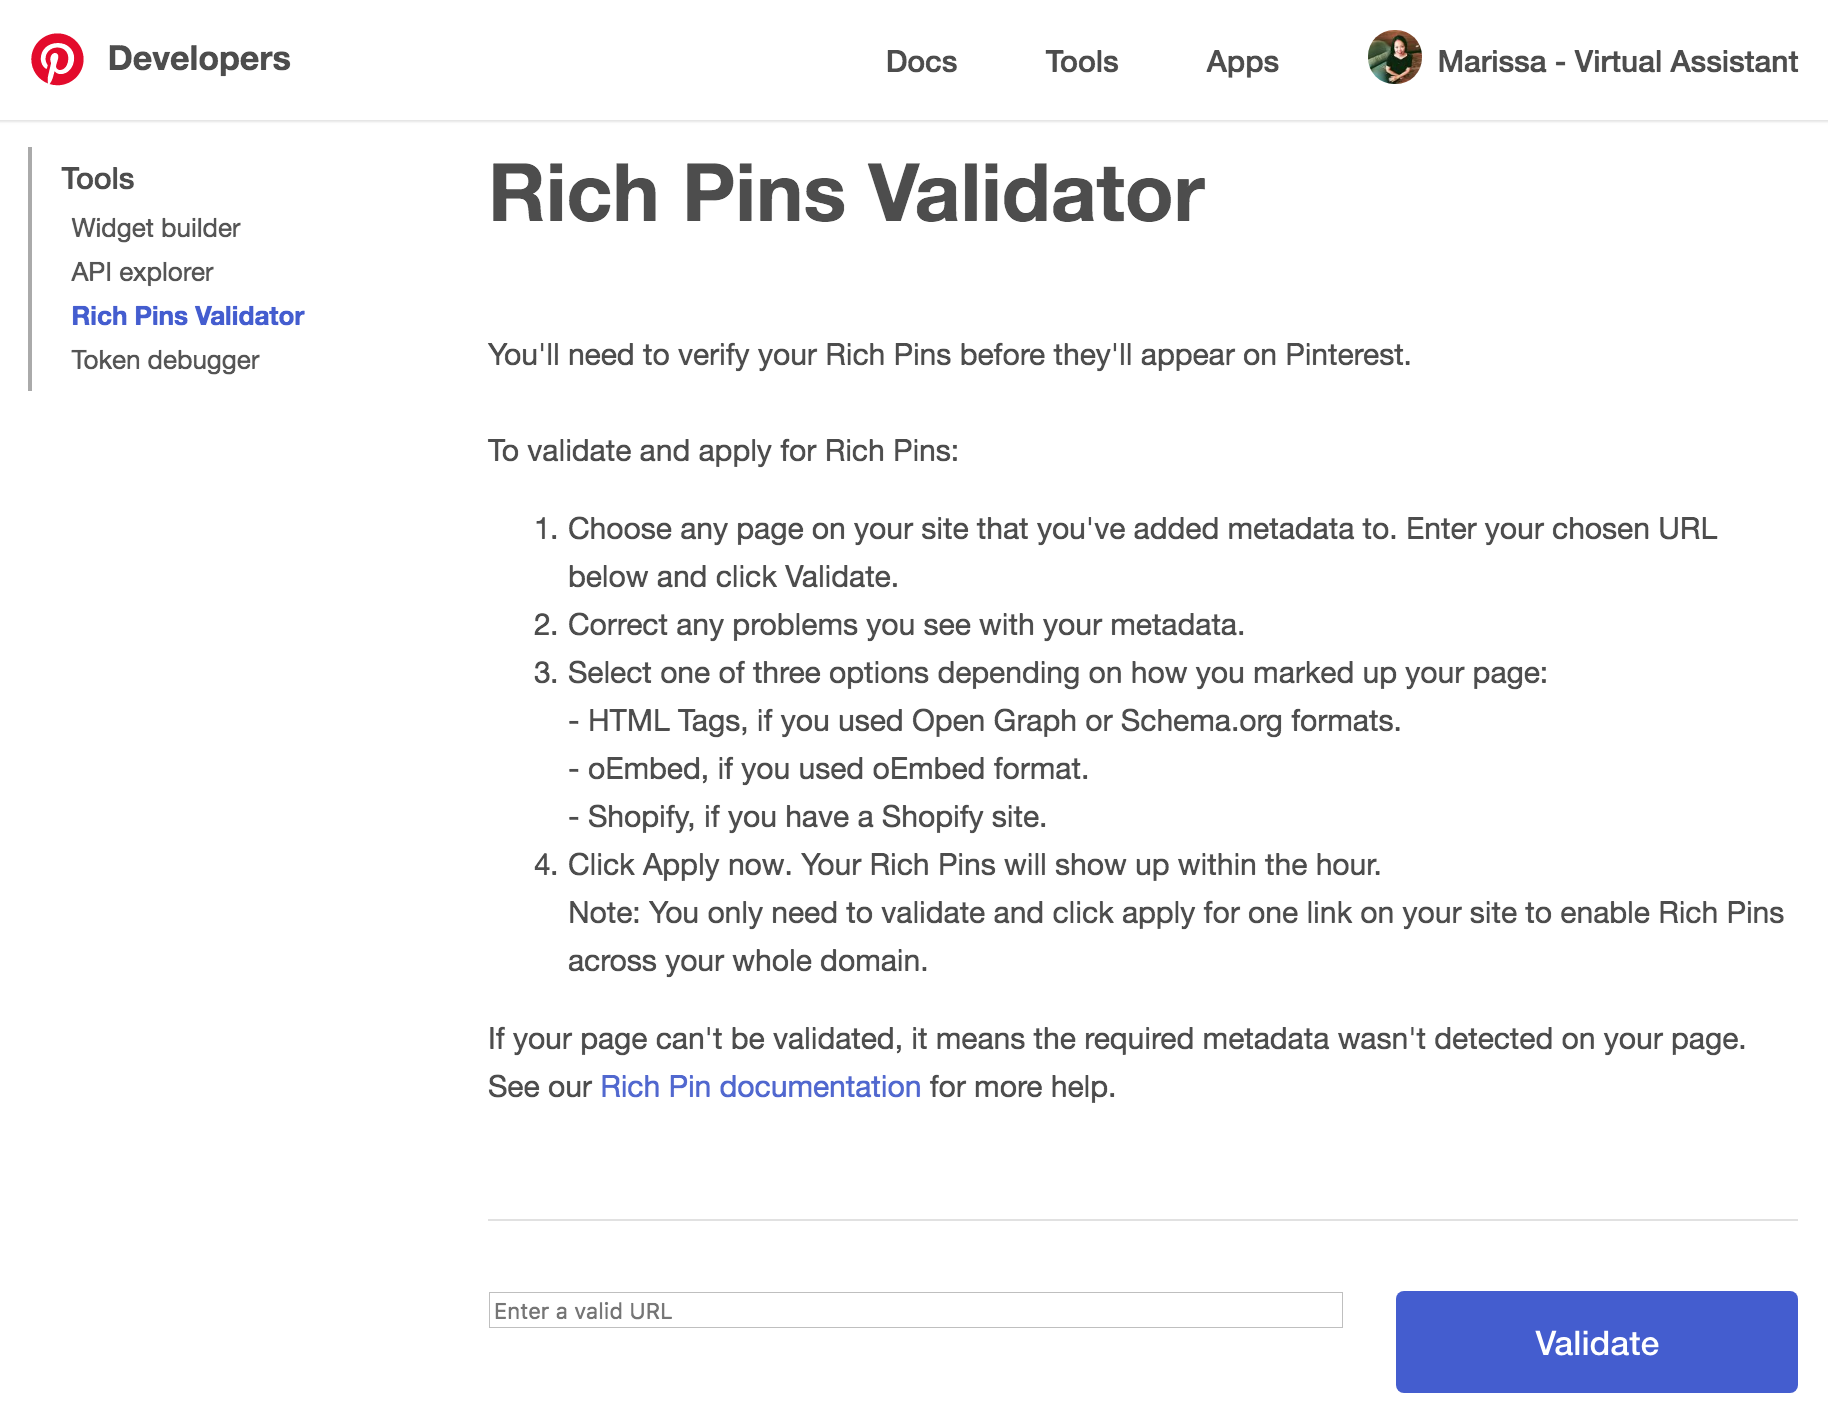 Rich Pins Validator #pinterestvirtualassistant #pinterestva #pinterestmanagement #pinterest #virtualassistant